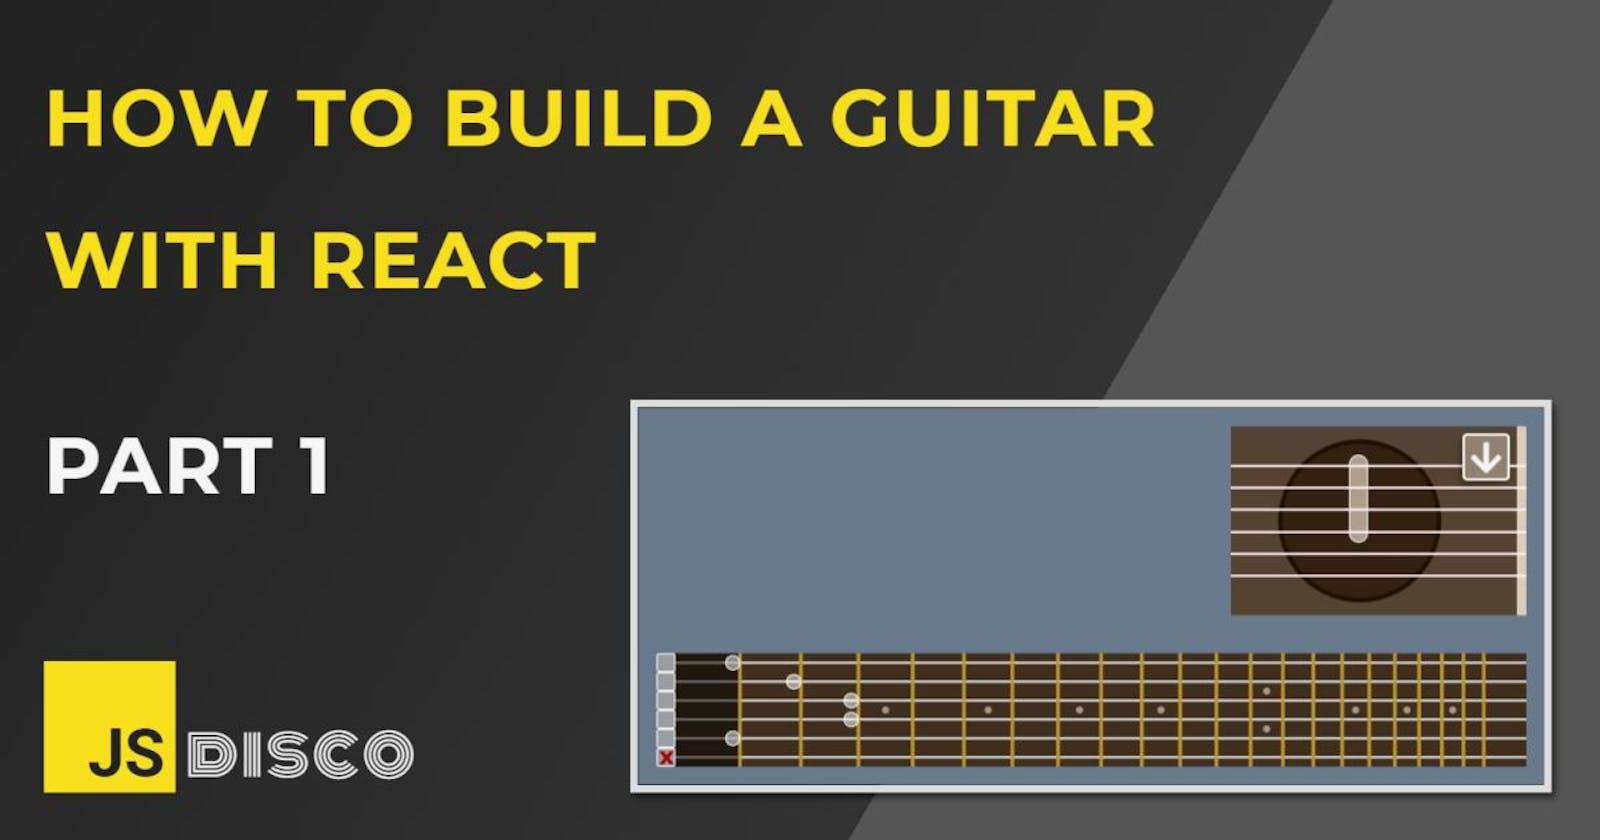 Build a Guitar with Reactjs (1): Intro, setup and guitar body